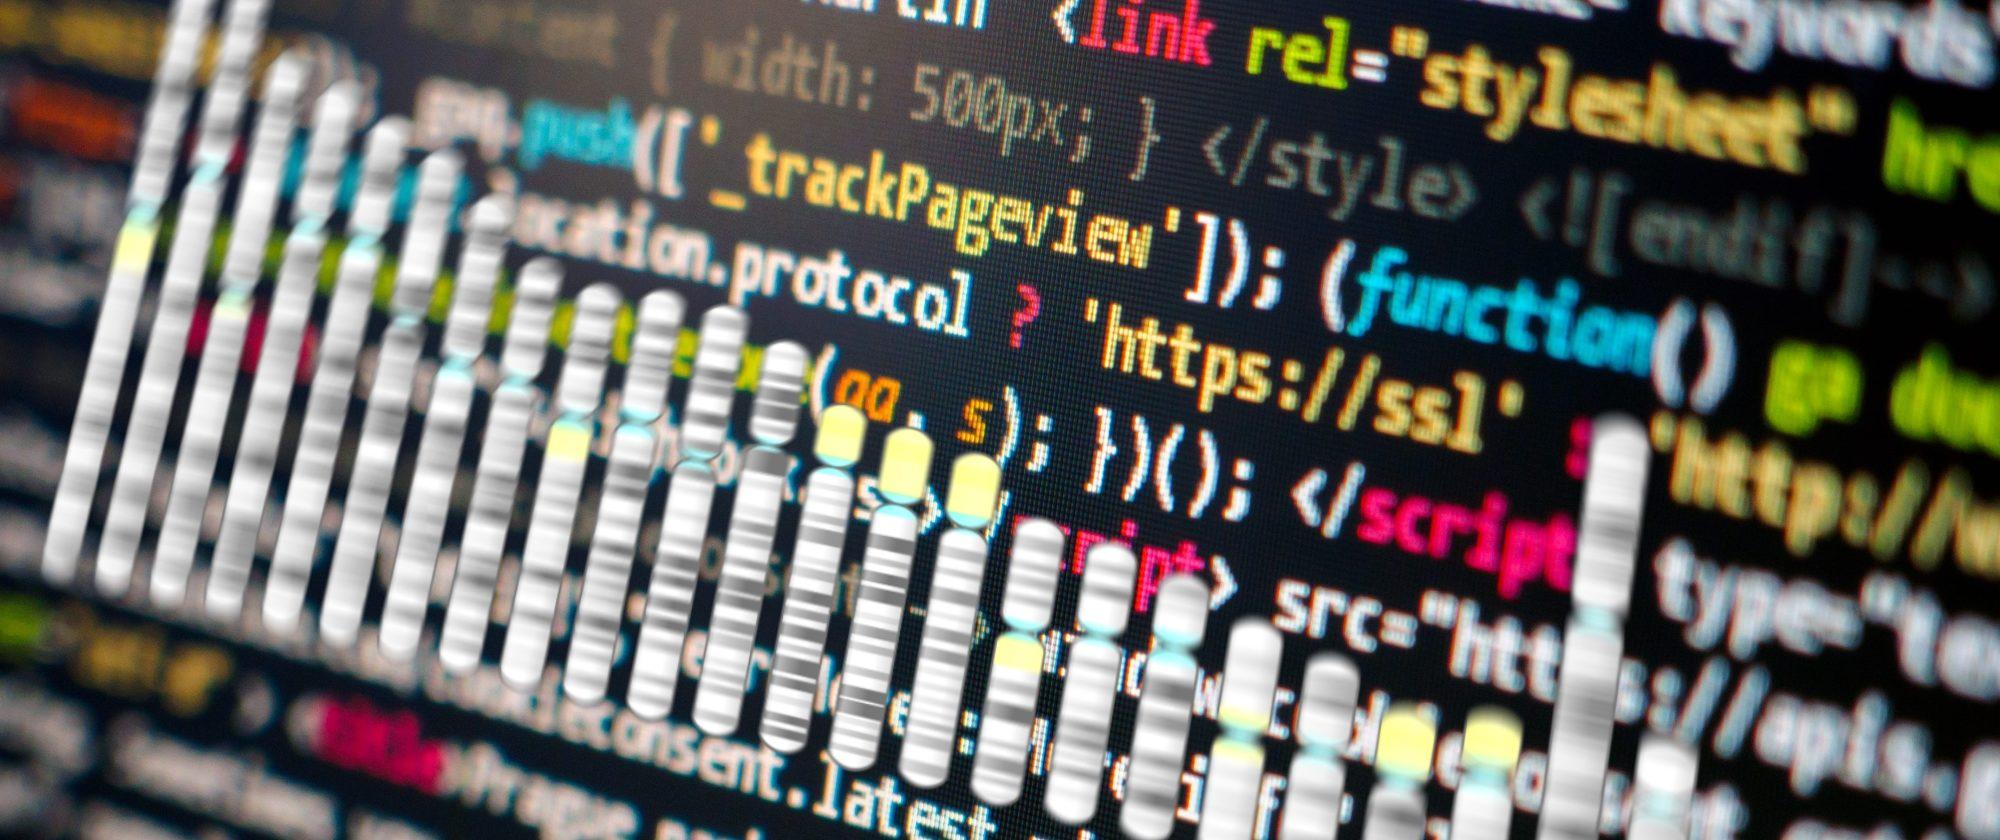 Ideograma de cromosomas humanos sobre un código de software. Imágenes Wikipedia Commons, Libreshot.